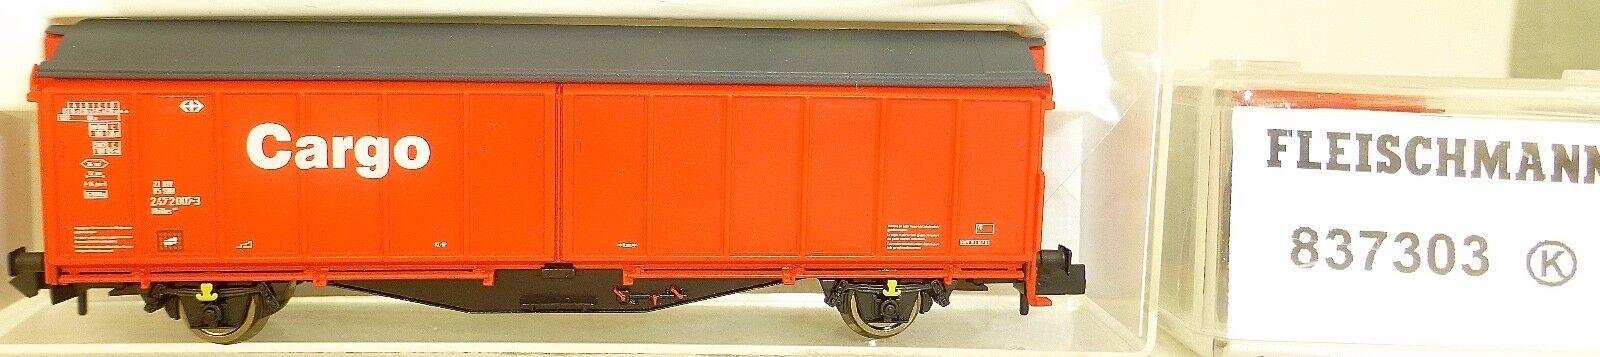 SBB Wagon avec Parroi Coulissant Hbillns DB Cargo Fleischmann 837303 N 1 160